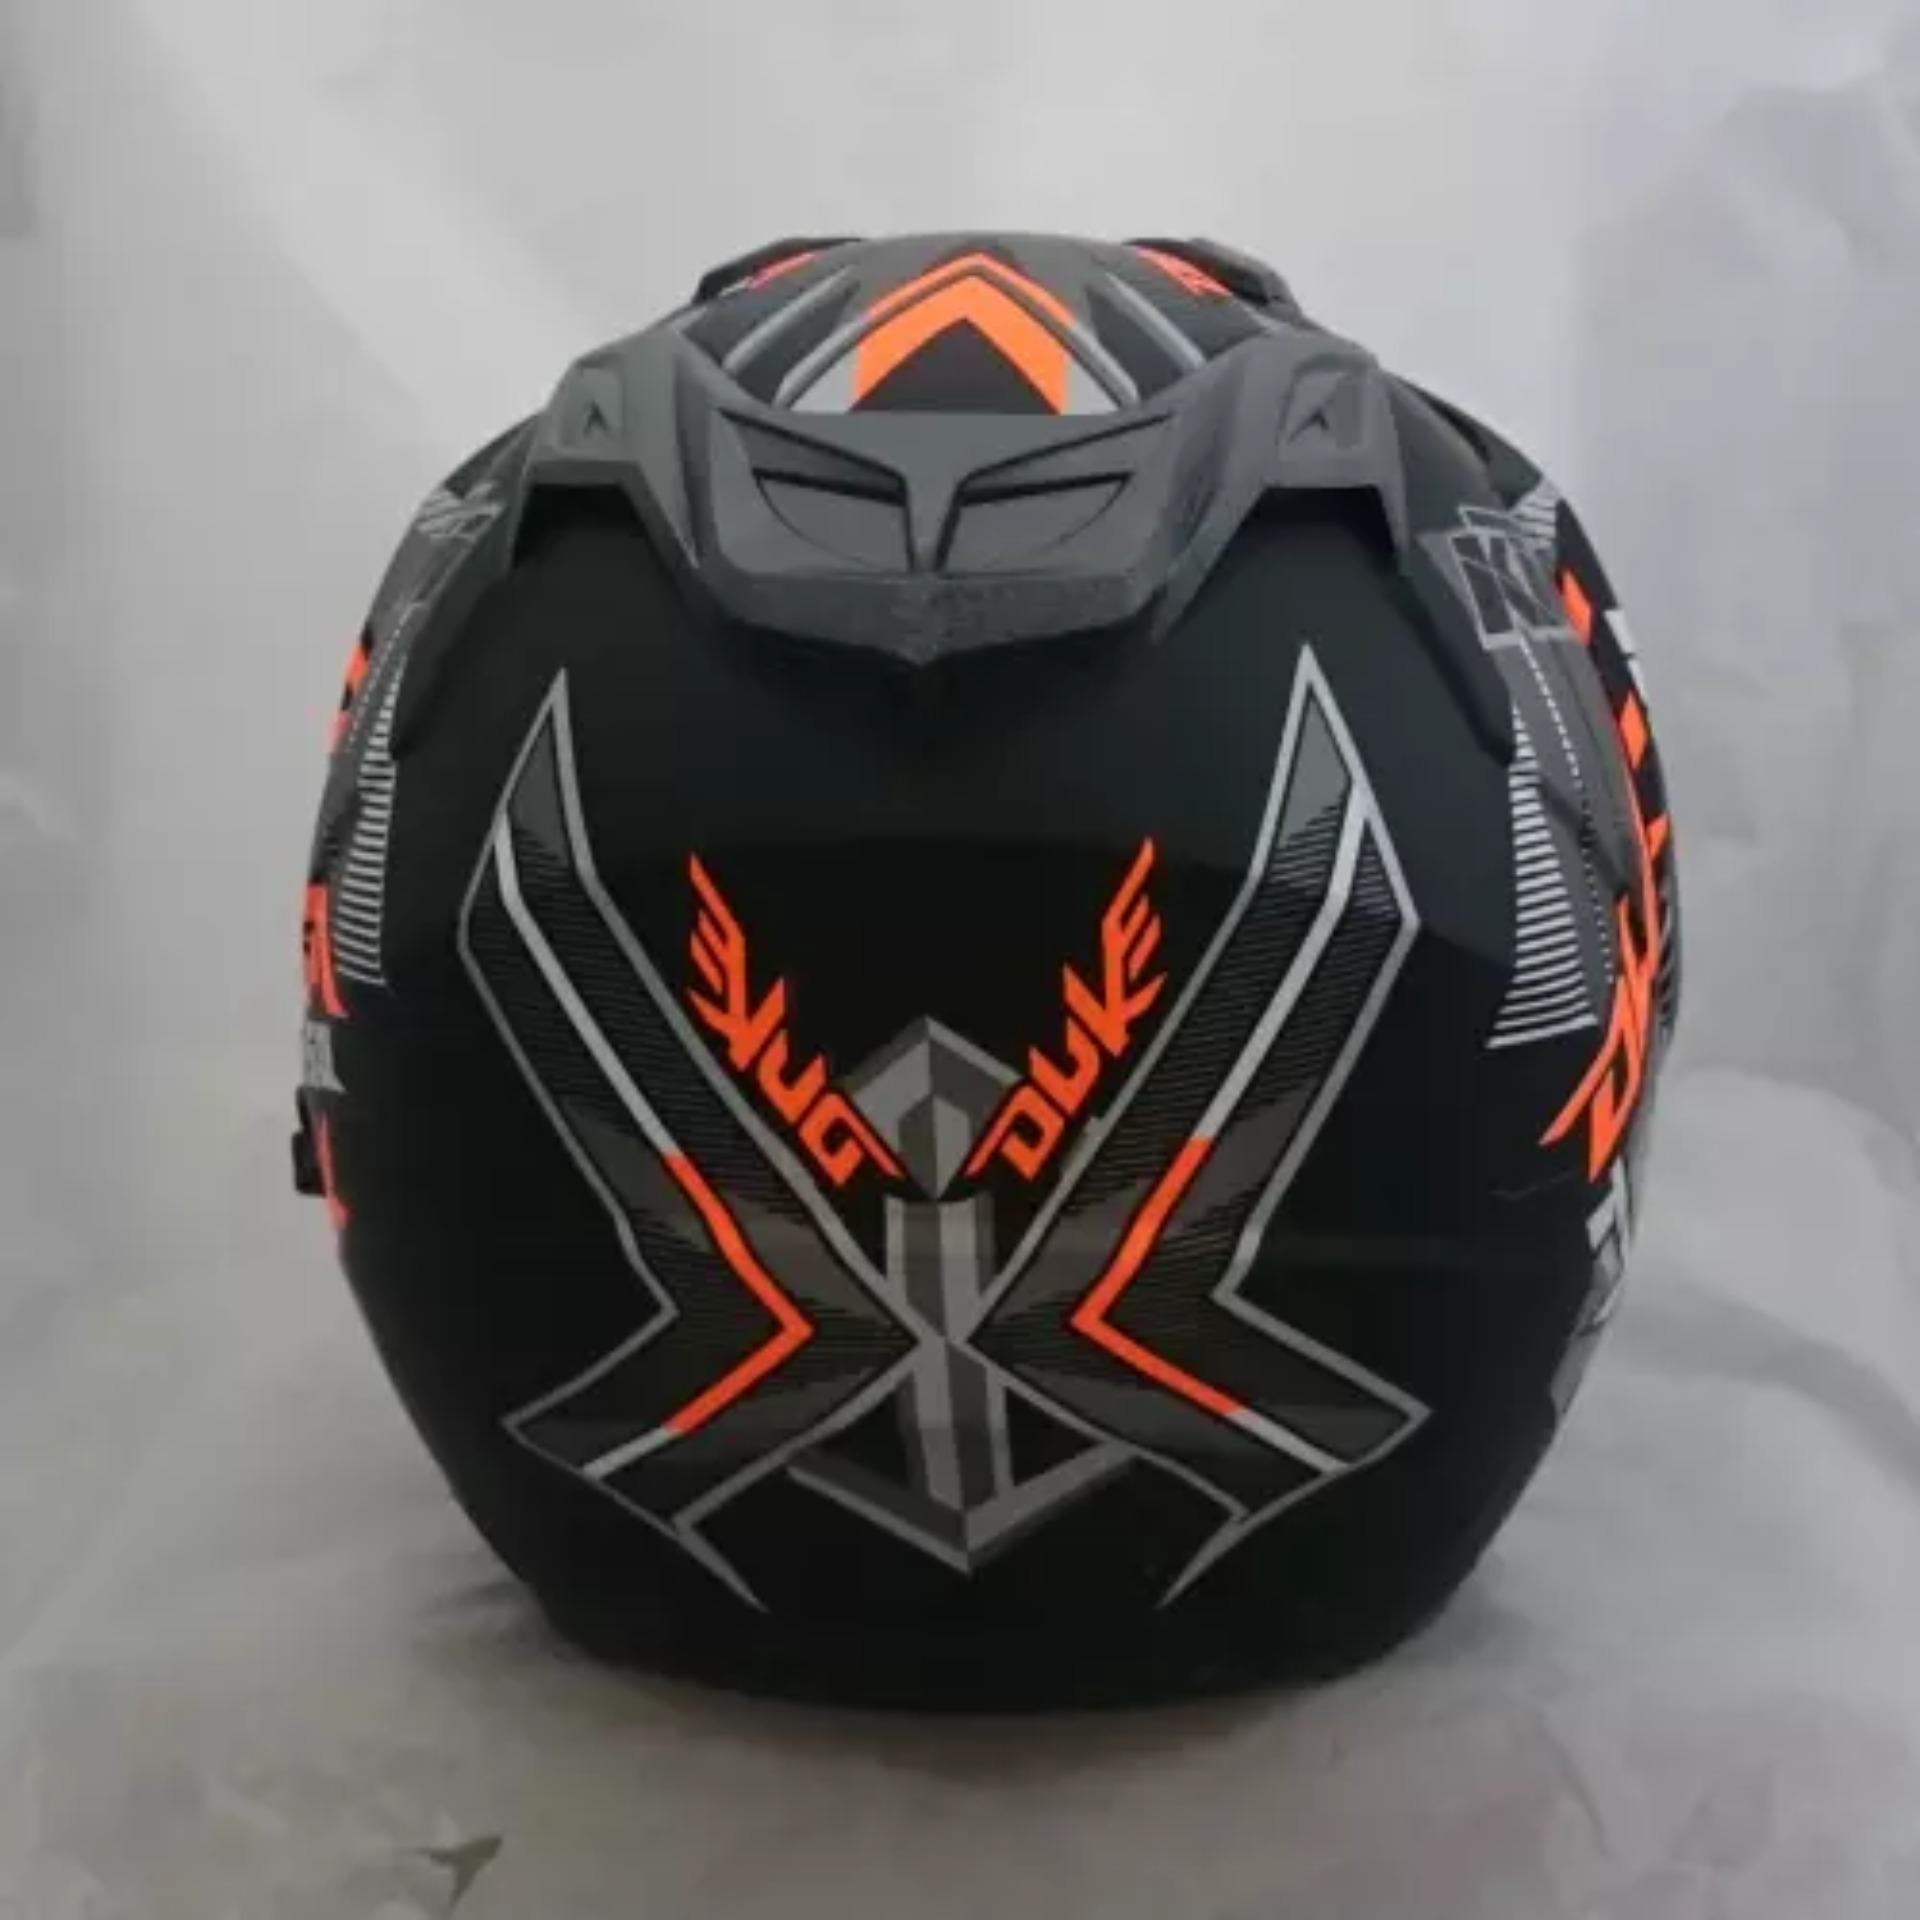 Periksa Peringkat Helm 2 Kaca Double Visor Murah Duke Black Doff Zeus Half Face Zs 610k Polos Hijau Tua Dove Orange Dmn